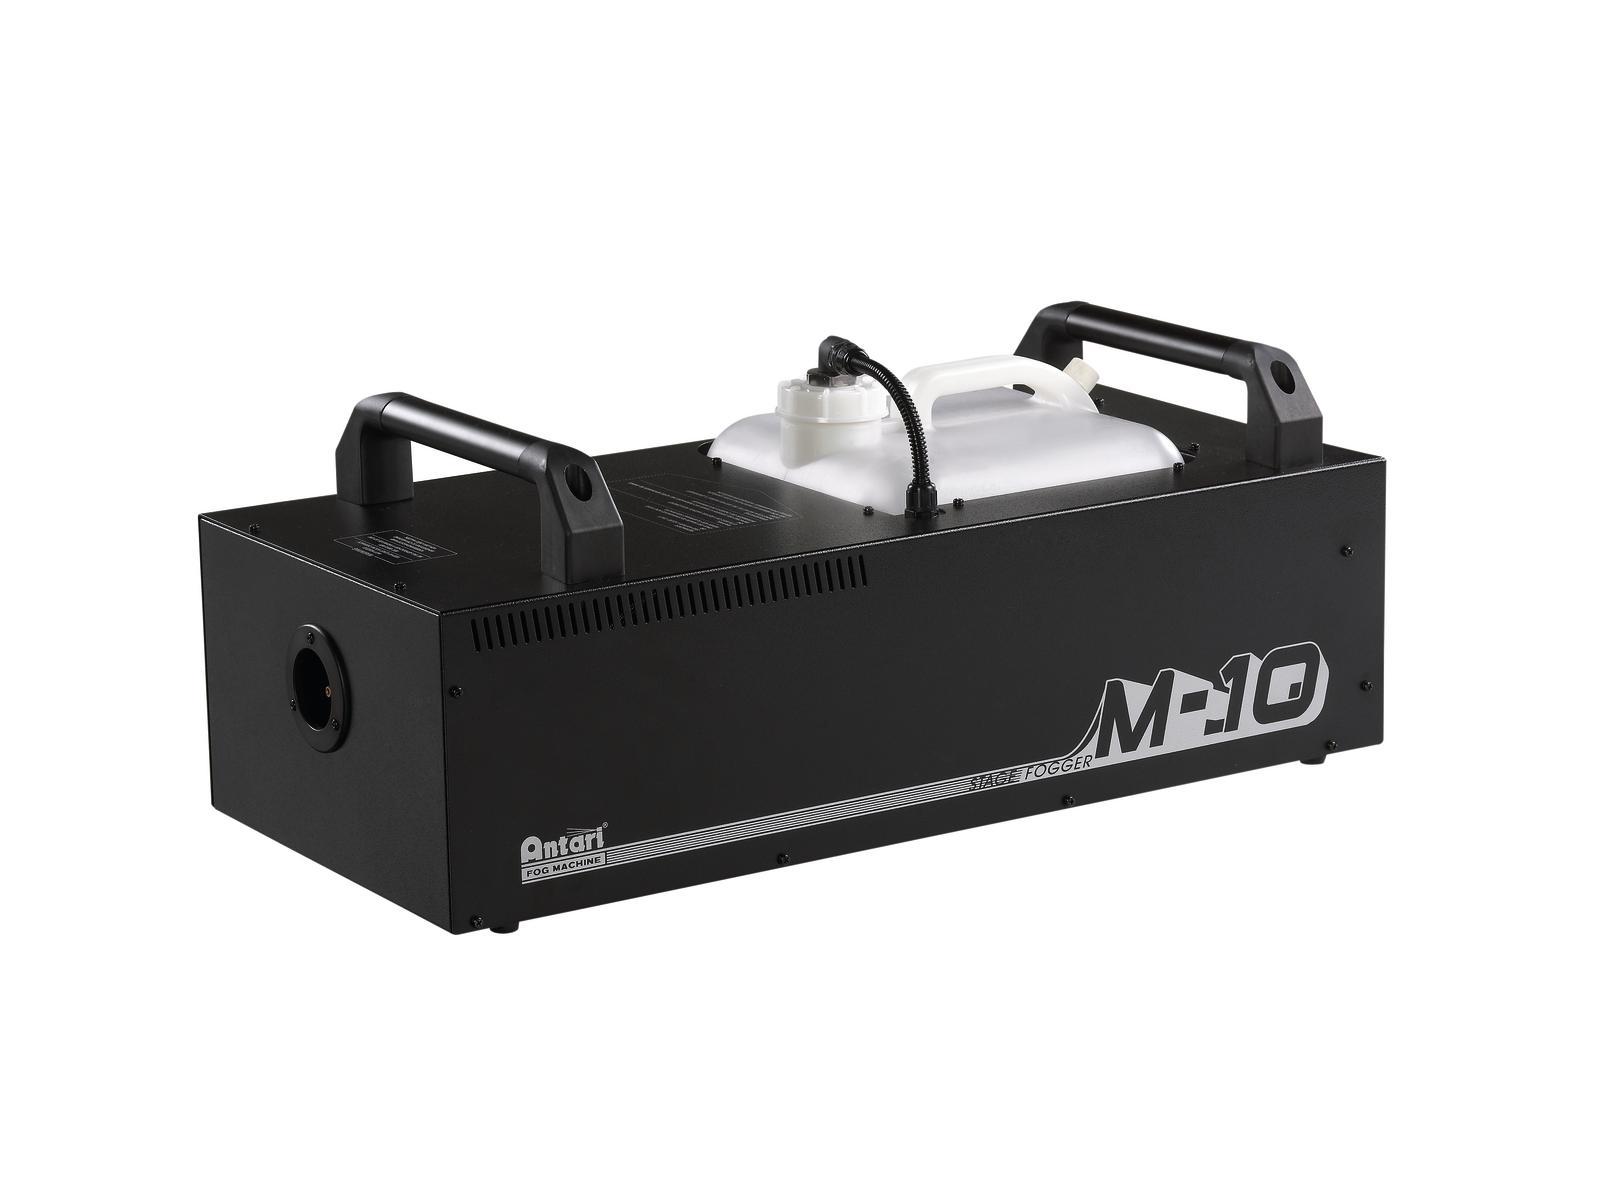 ANTARI M-10W Fase Fogger